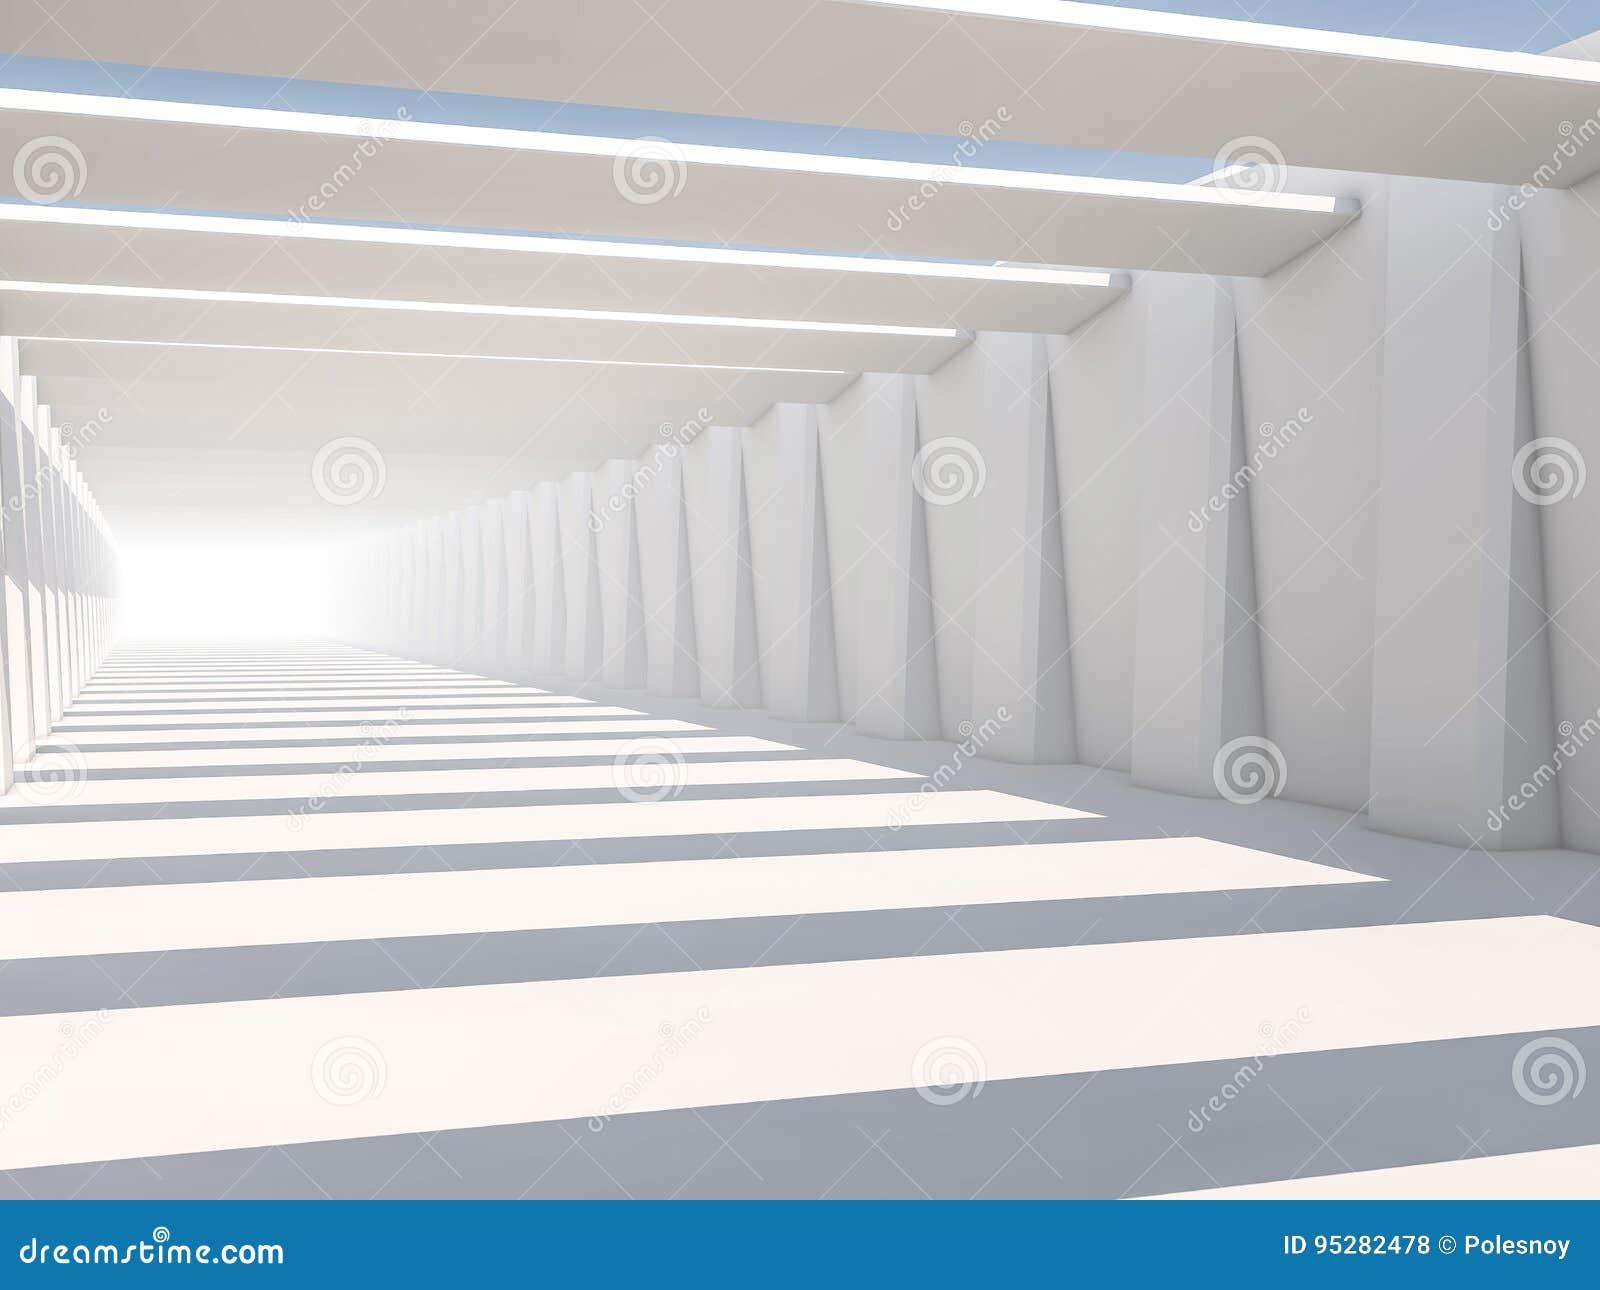 Abstrakt modern arkitekturbakgrund, tomt vitt öppet utrymme